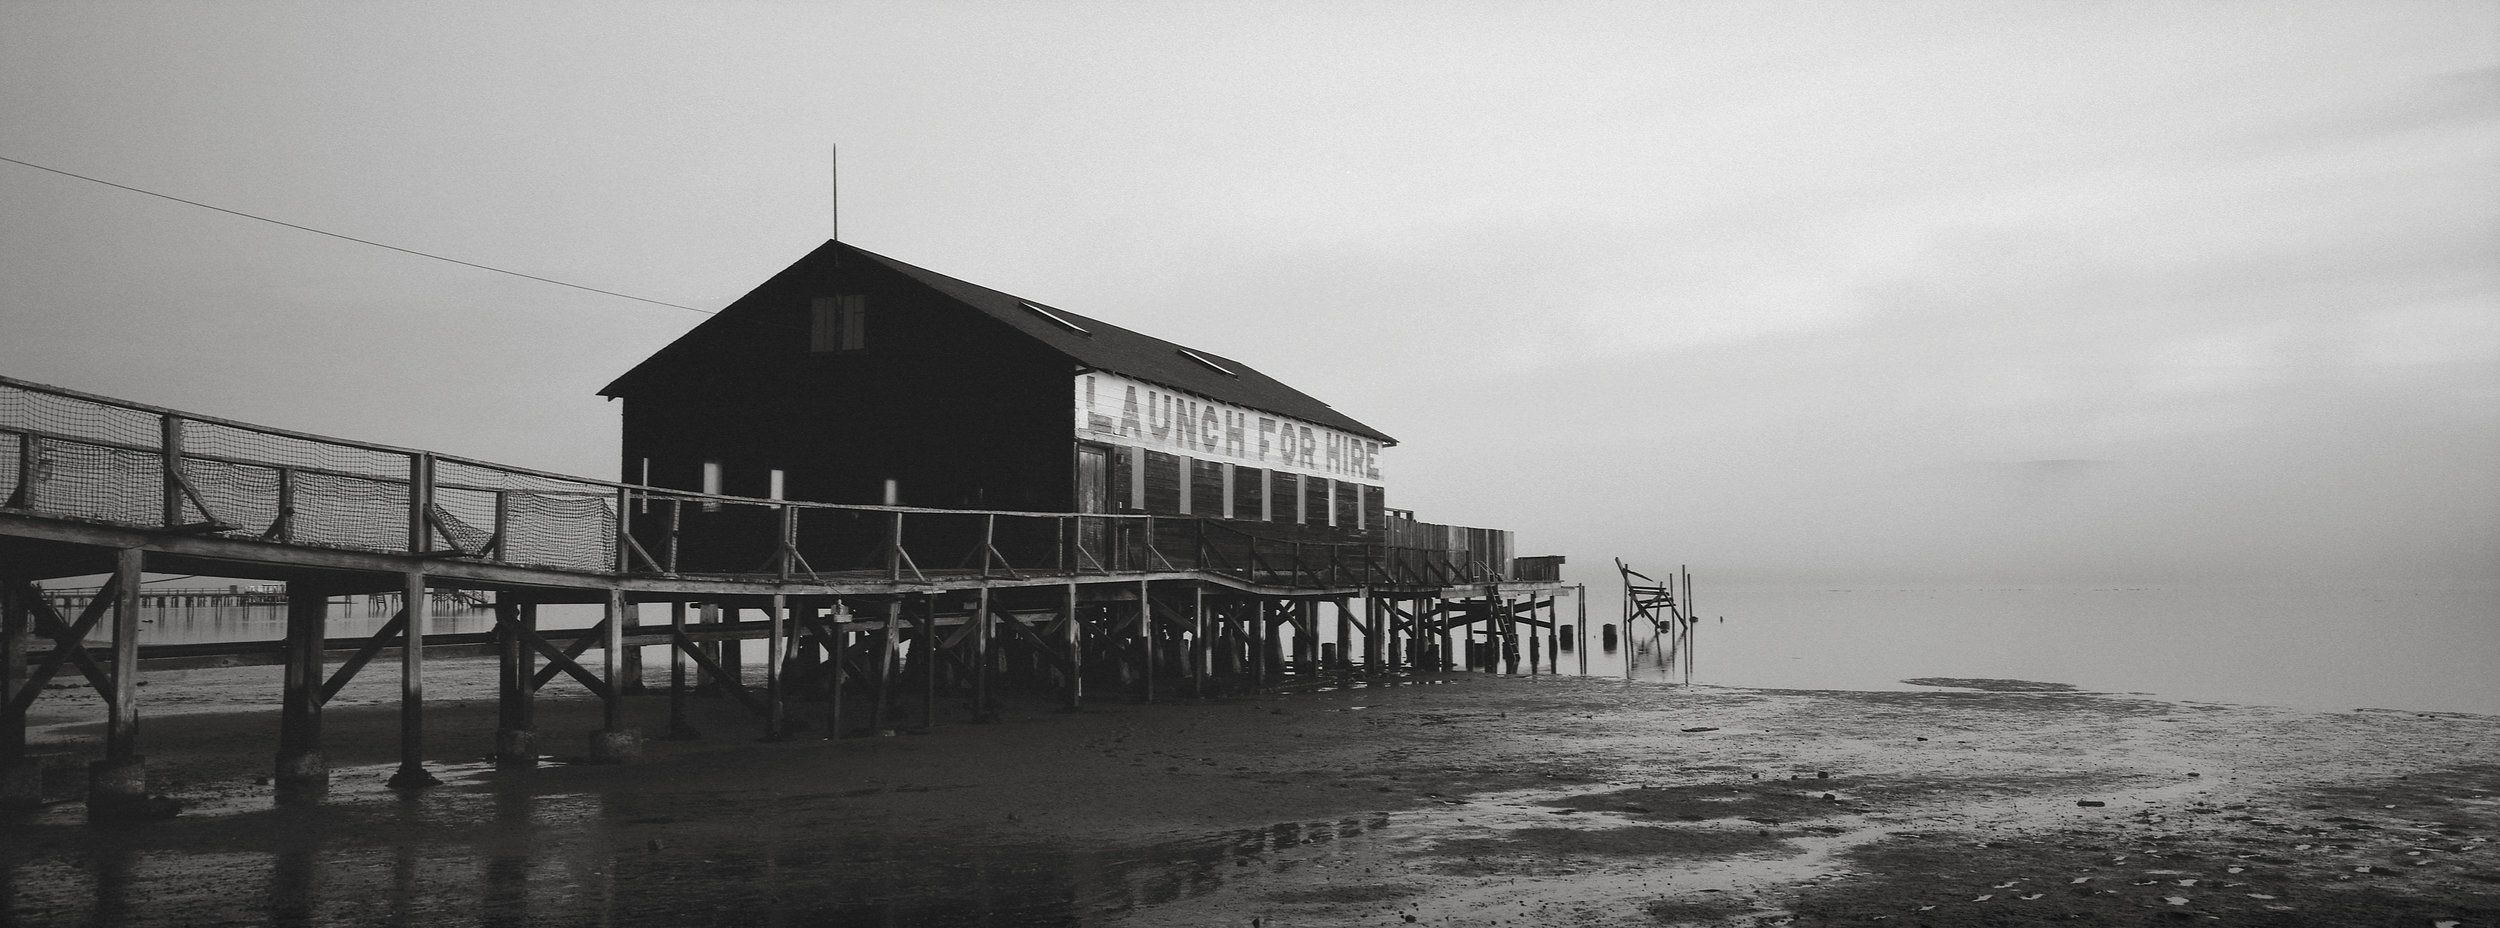 Early Morning, Tomales Bay, California